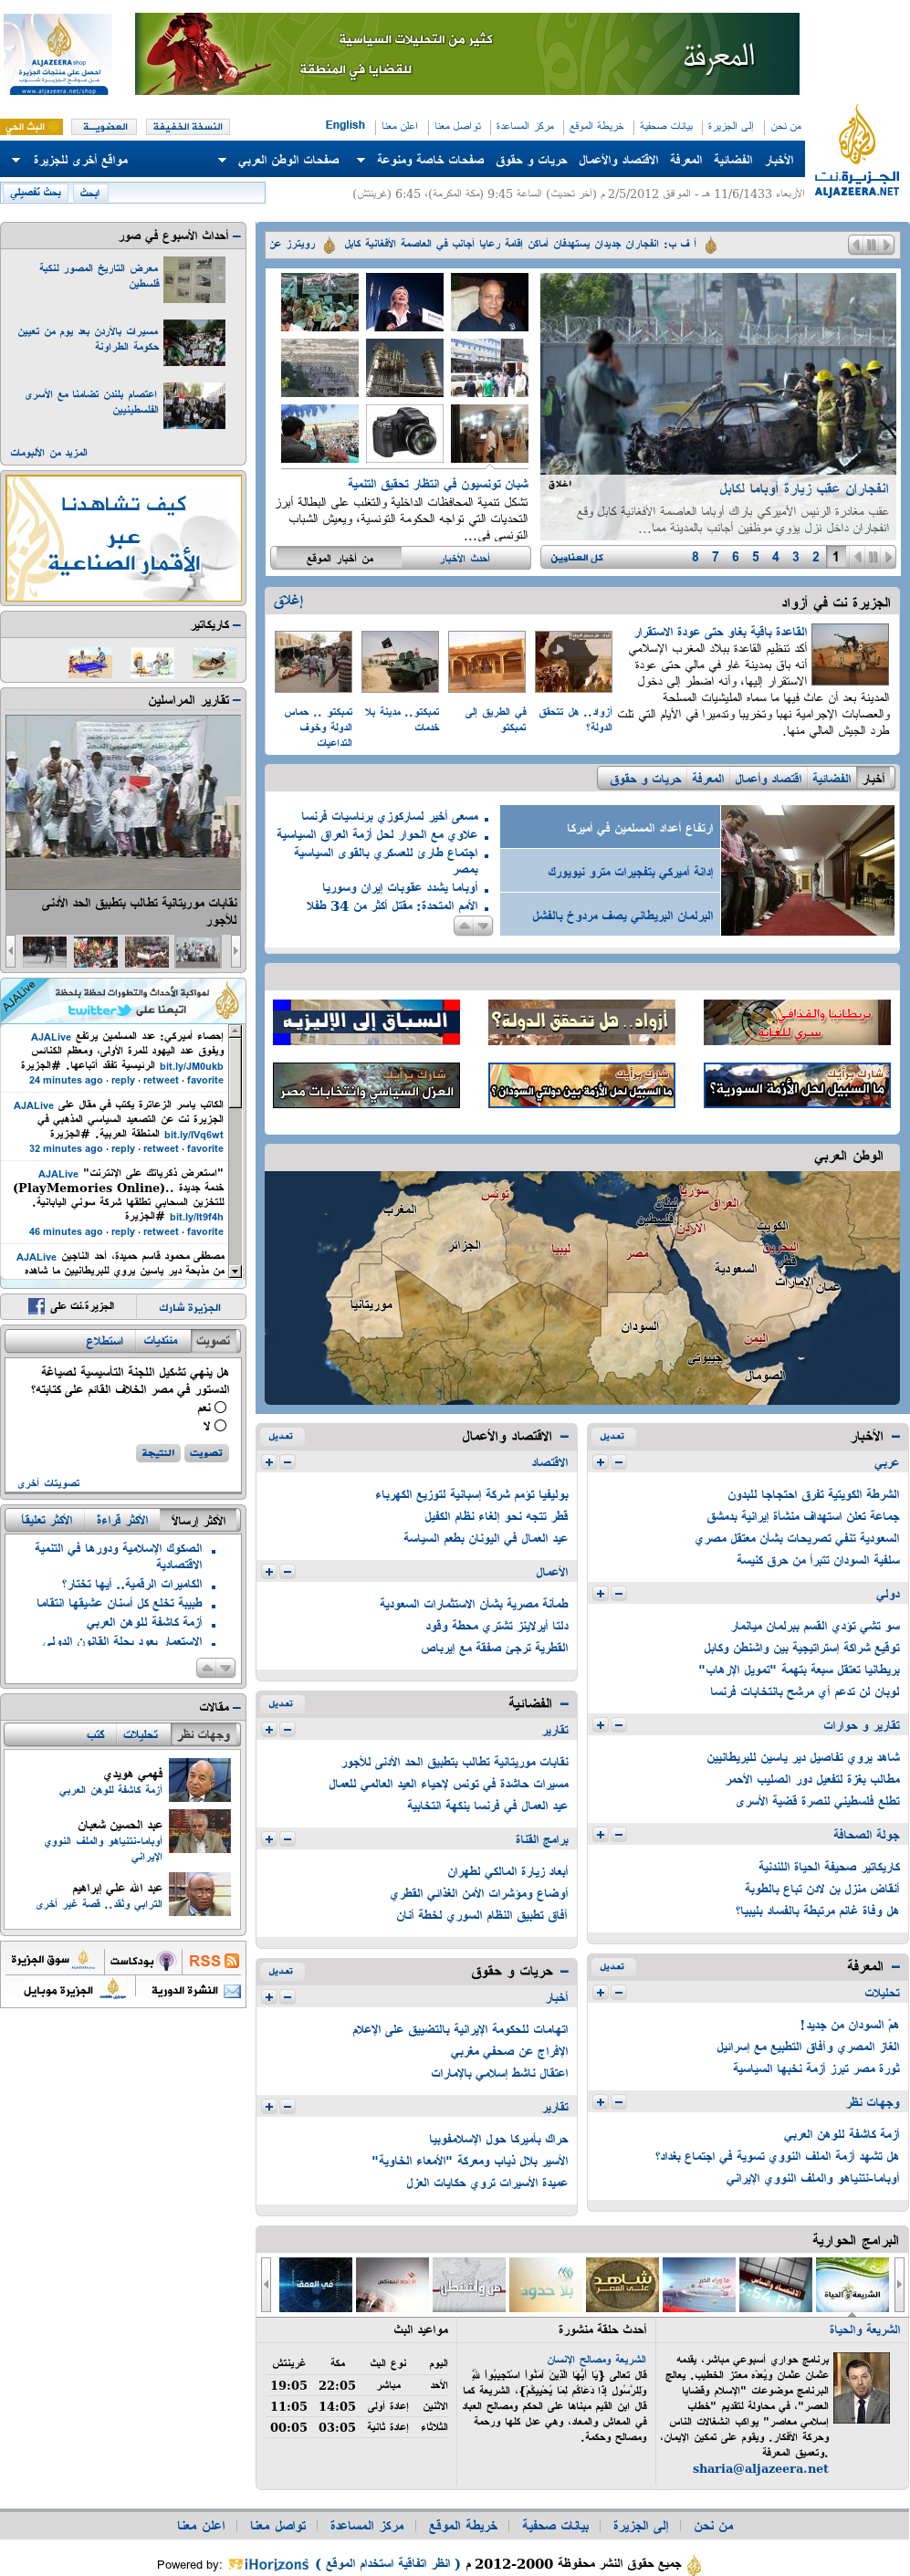 Al Jazeera at Wednesday May 2, 2012, 7 a.m. UTC